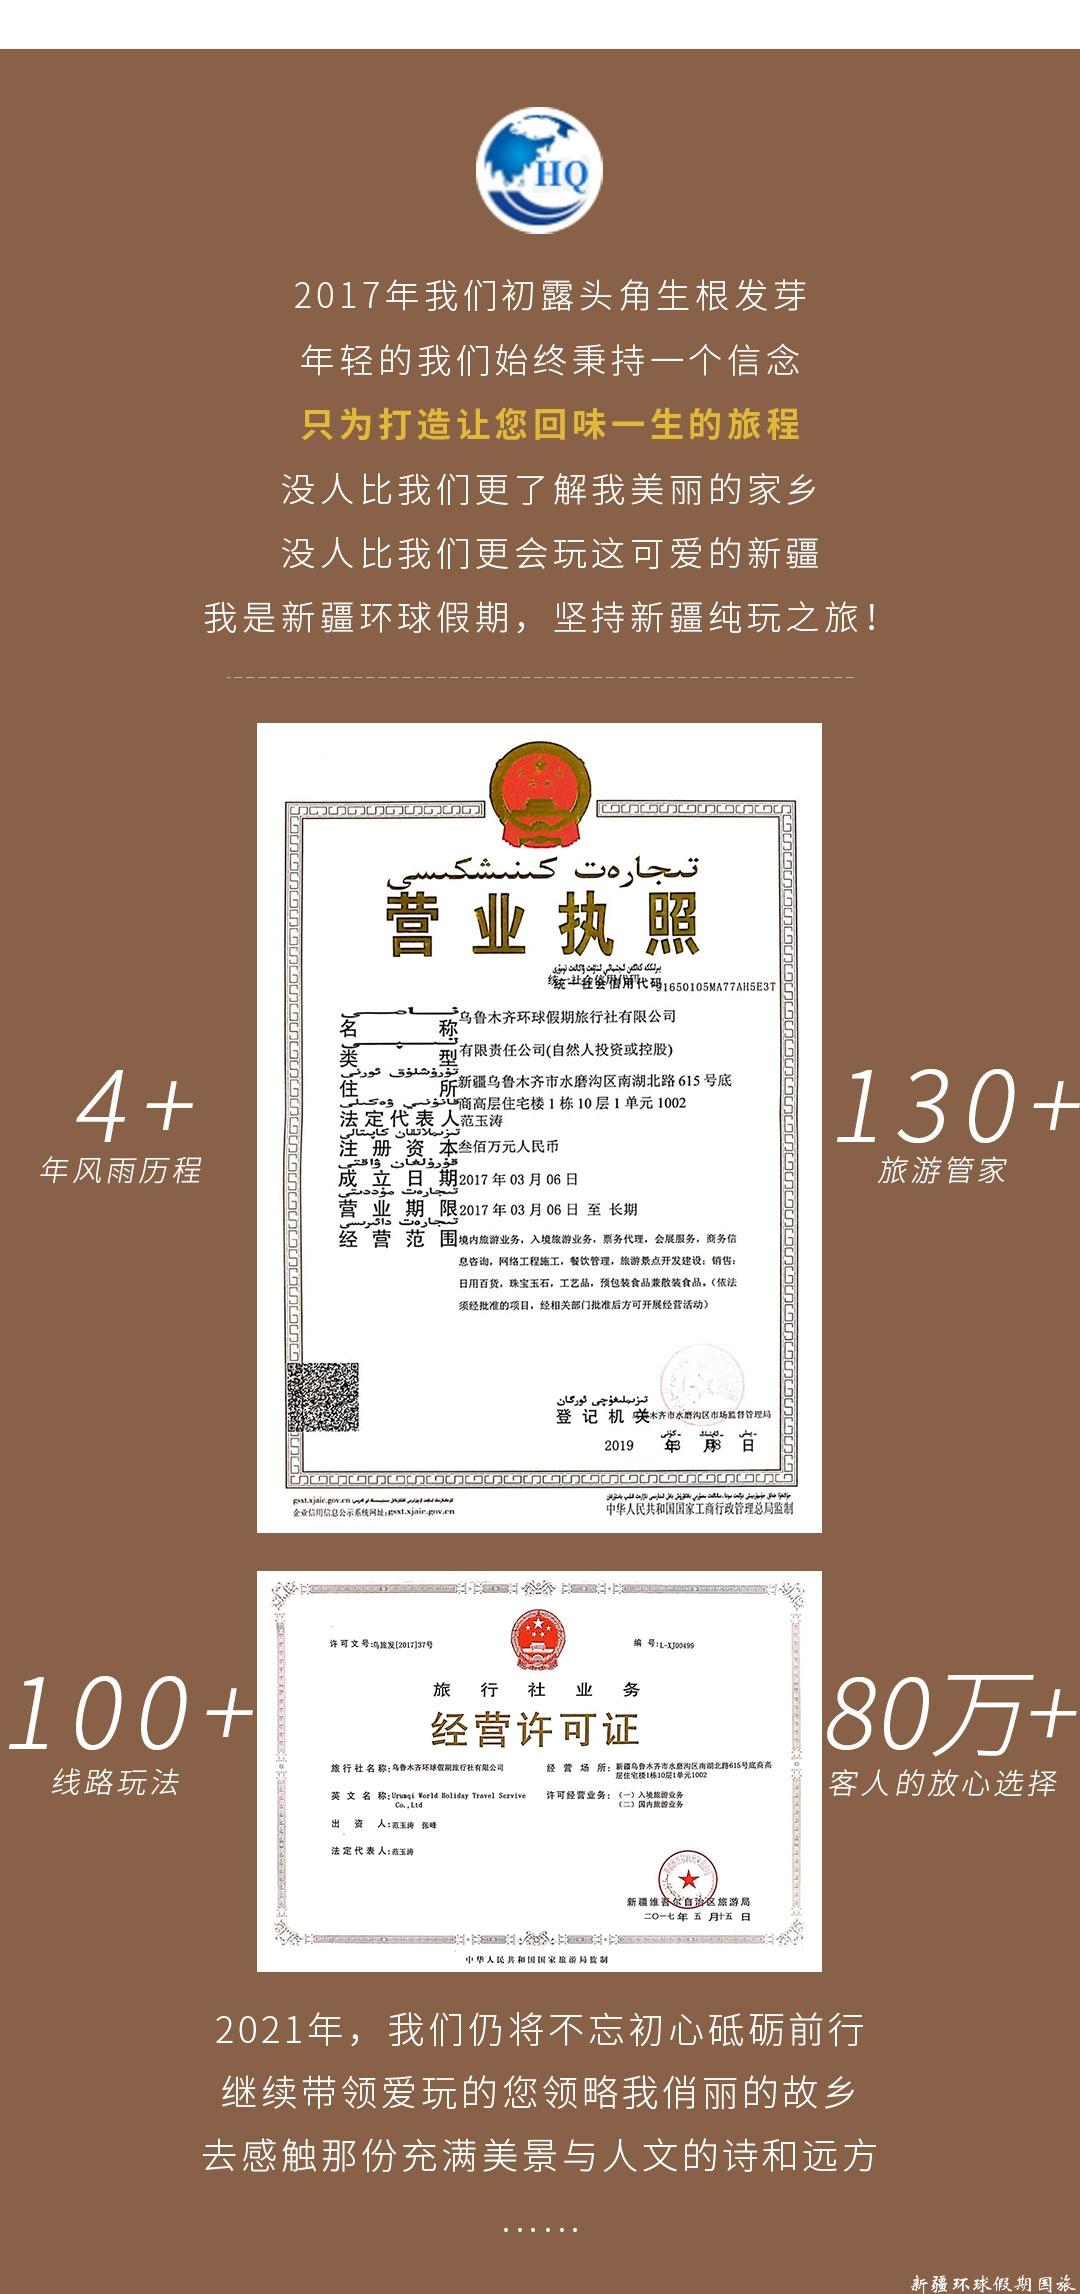 B1-HQB-022+5_11